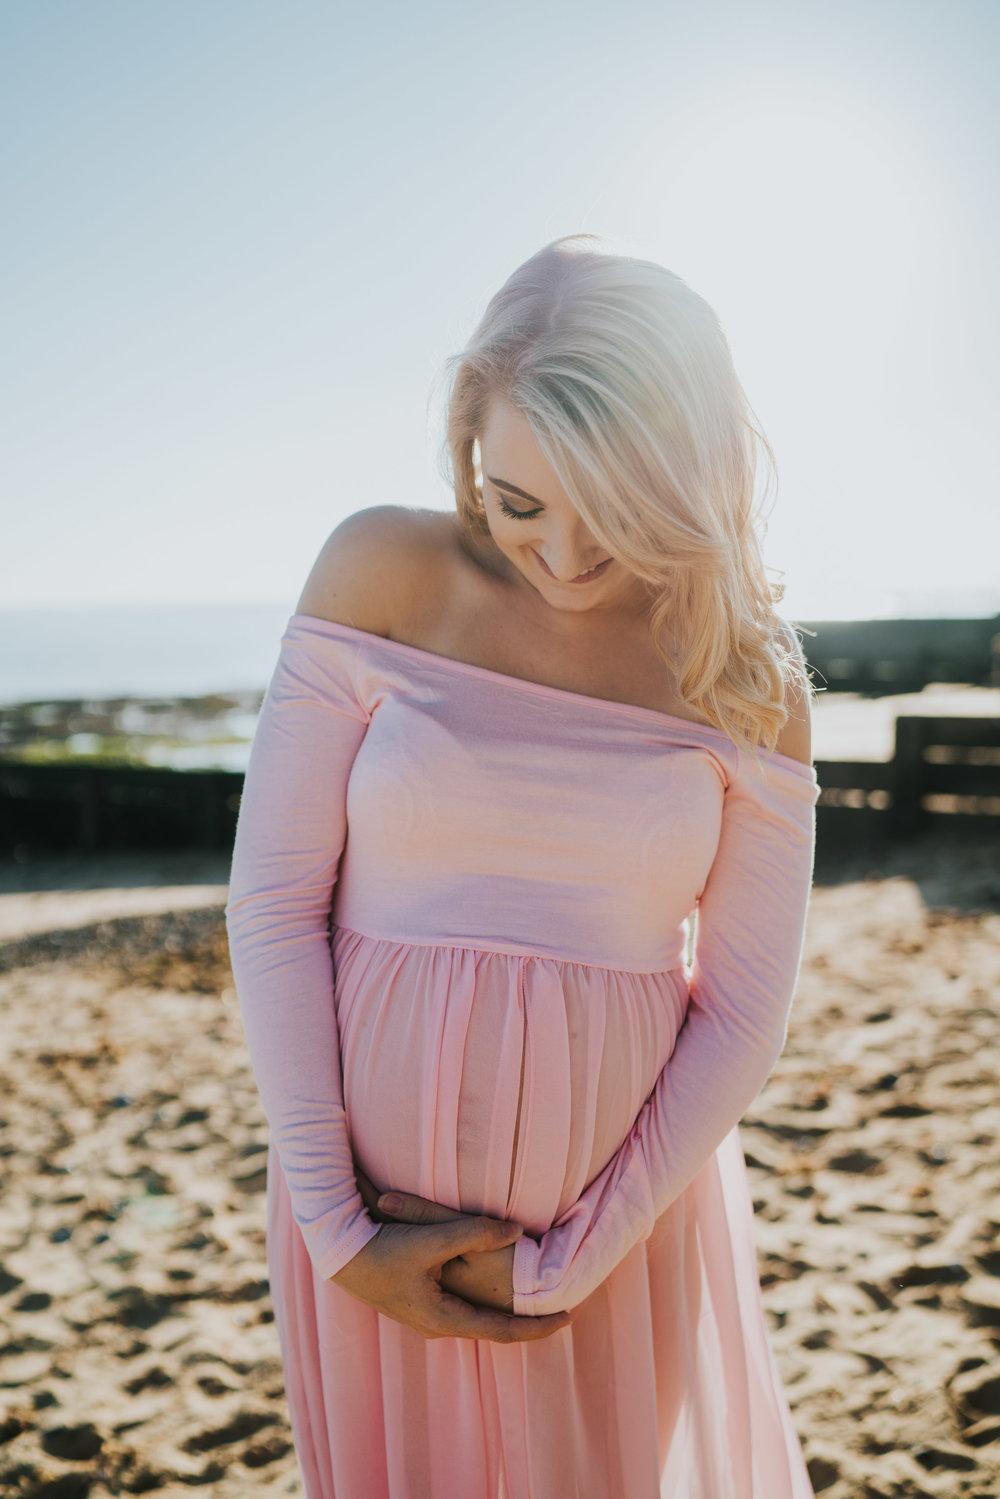 jess-kerion-maternity-27-weeks-pregnant-baby-girl-grace-elizabeth-colchester-essex-alternative-wedding-lifestyle-photographer-norfolk-suffolk-devon-kent-lifestyle-session (28 of 41).jpg